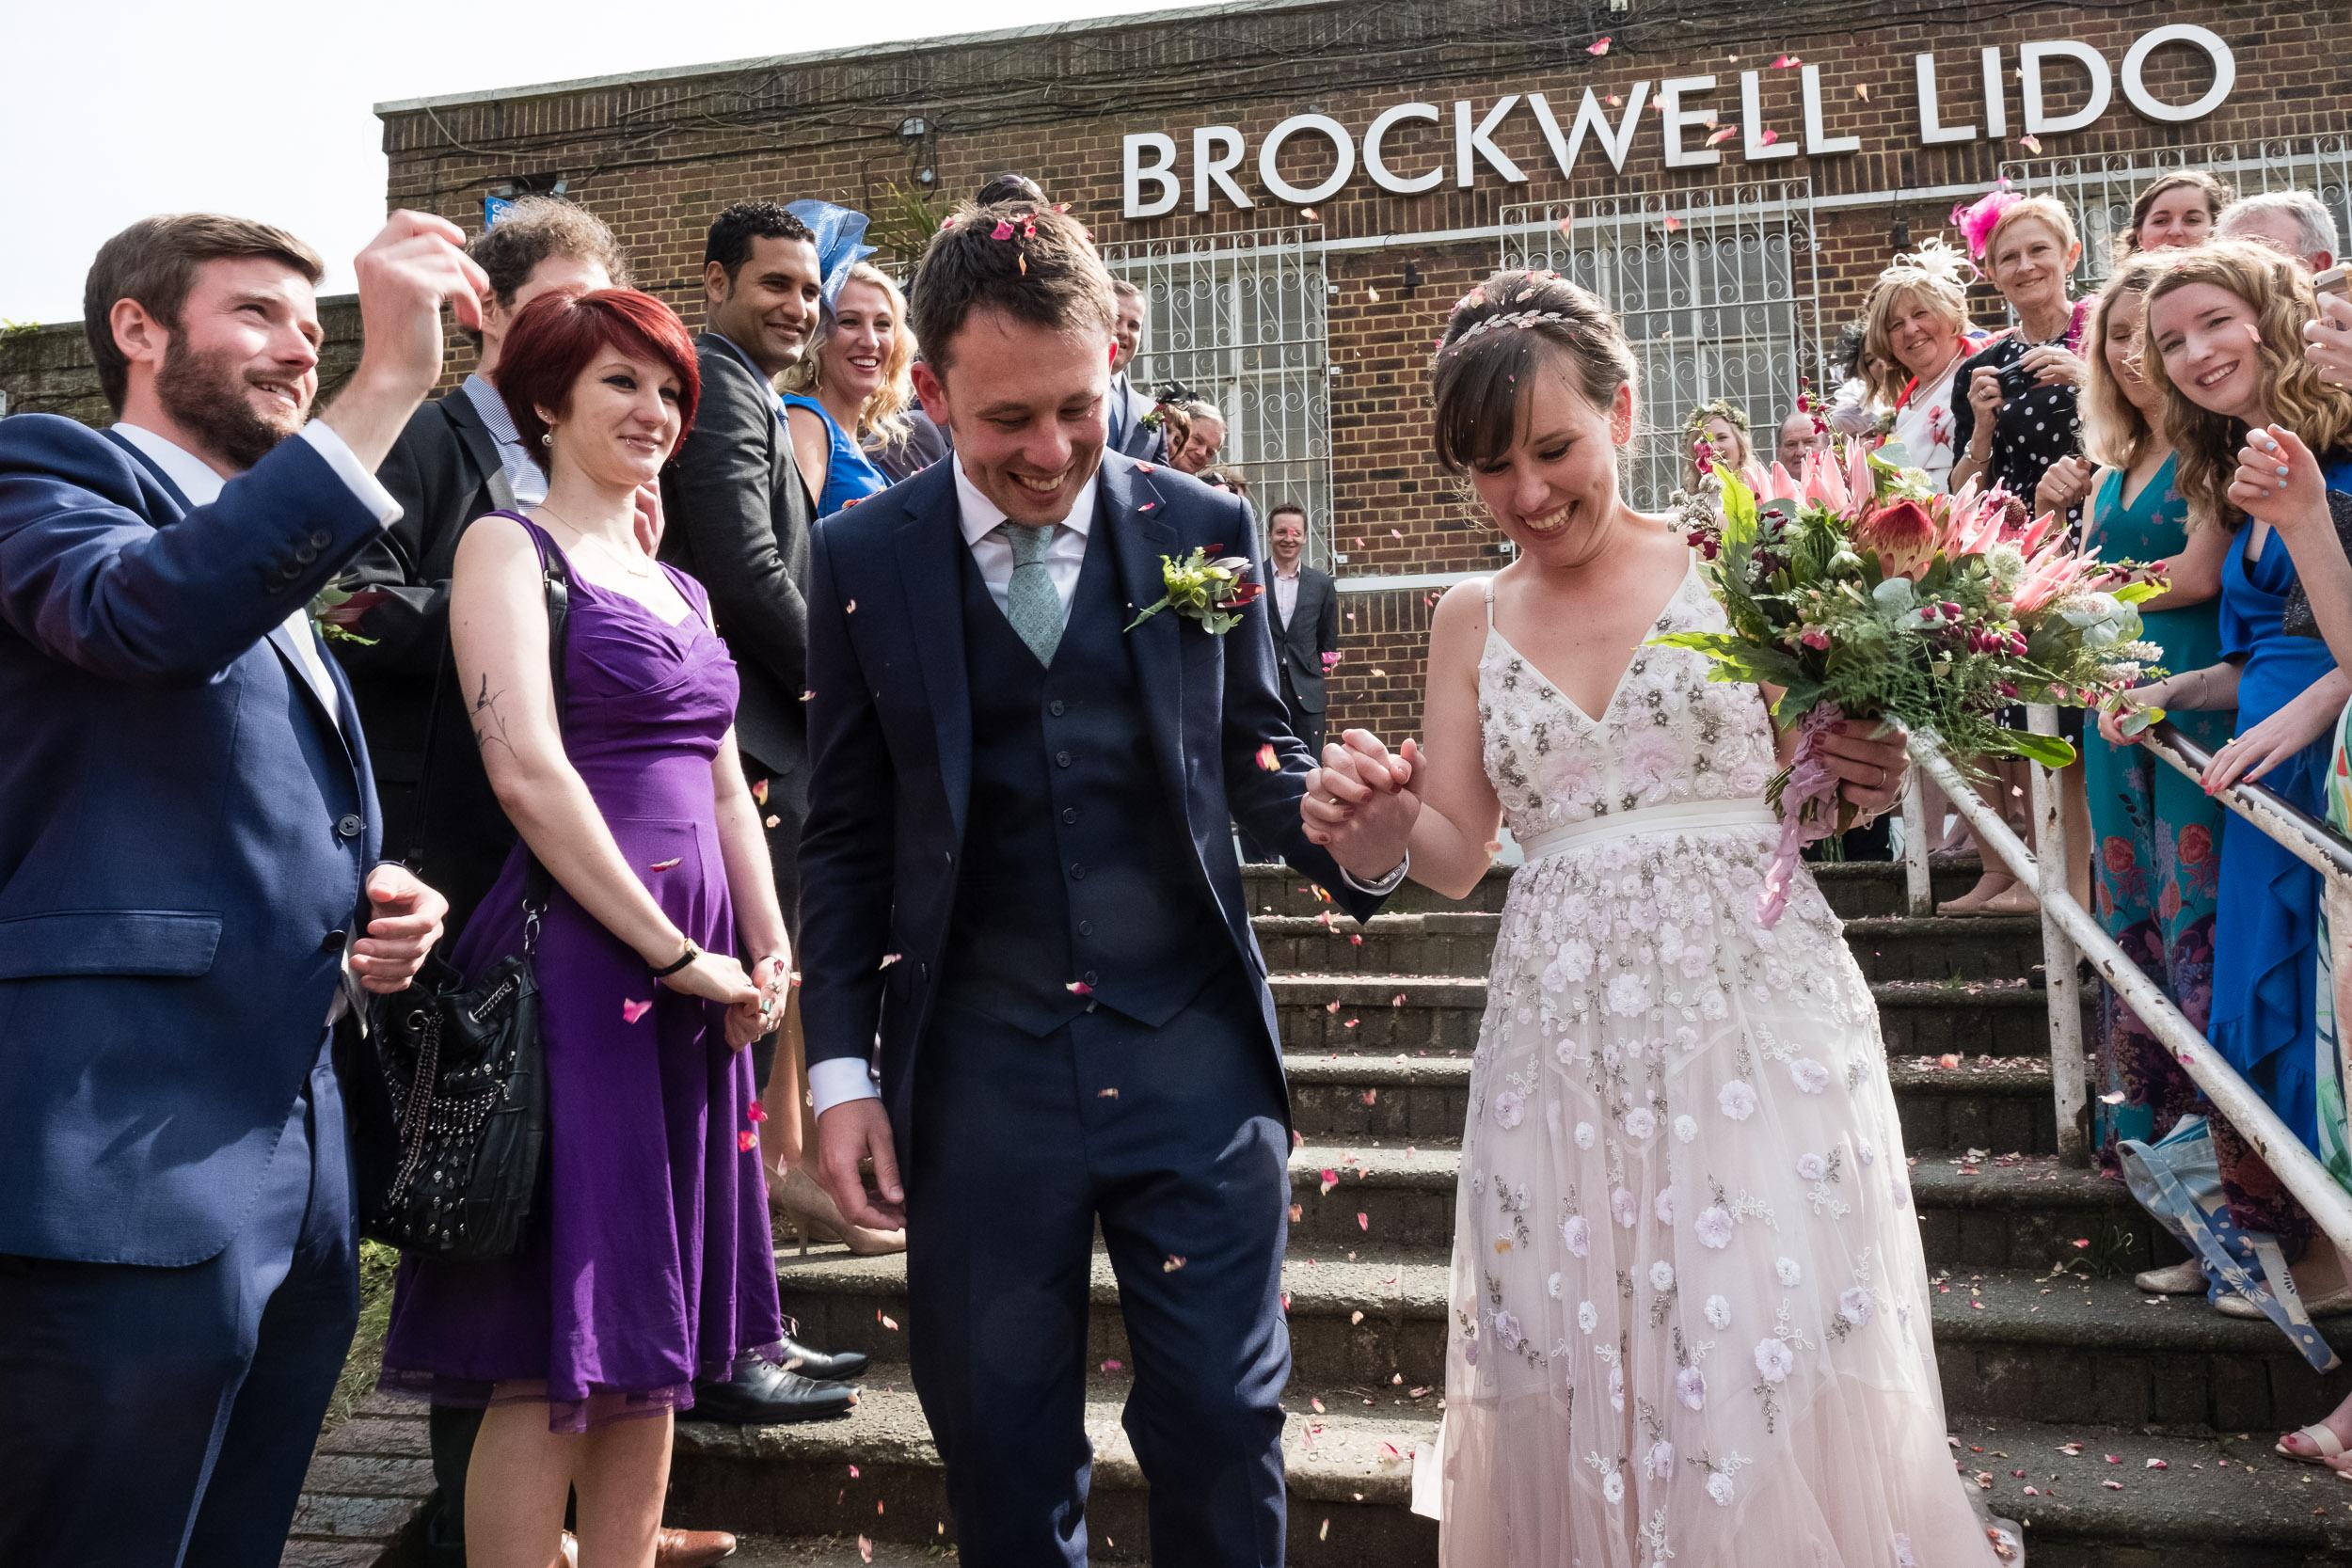 brockwell-lido-brixton-herne-hill-wedding-214.jpg